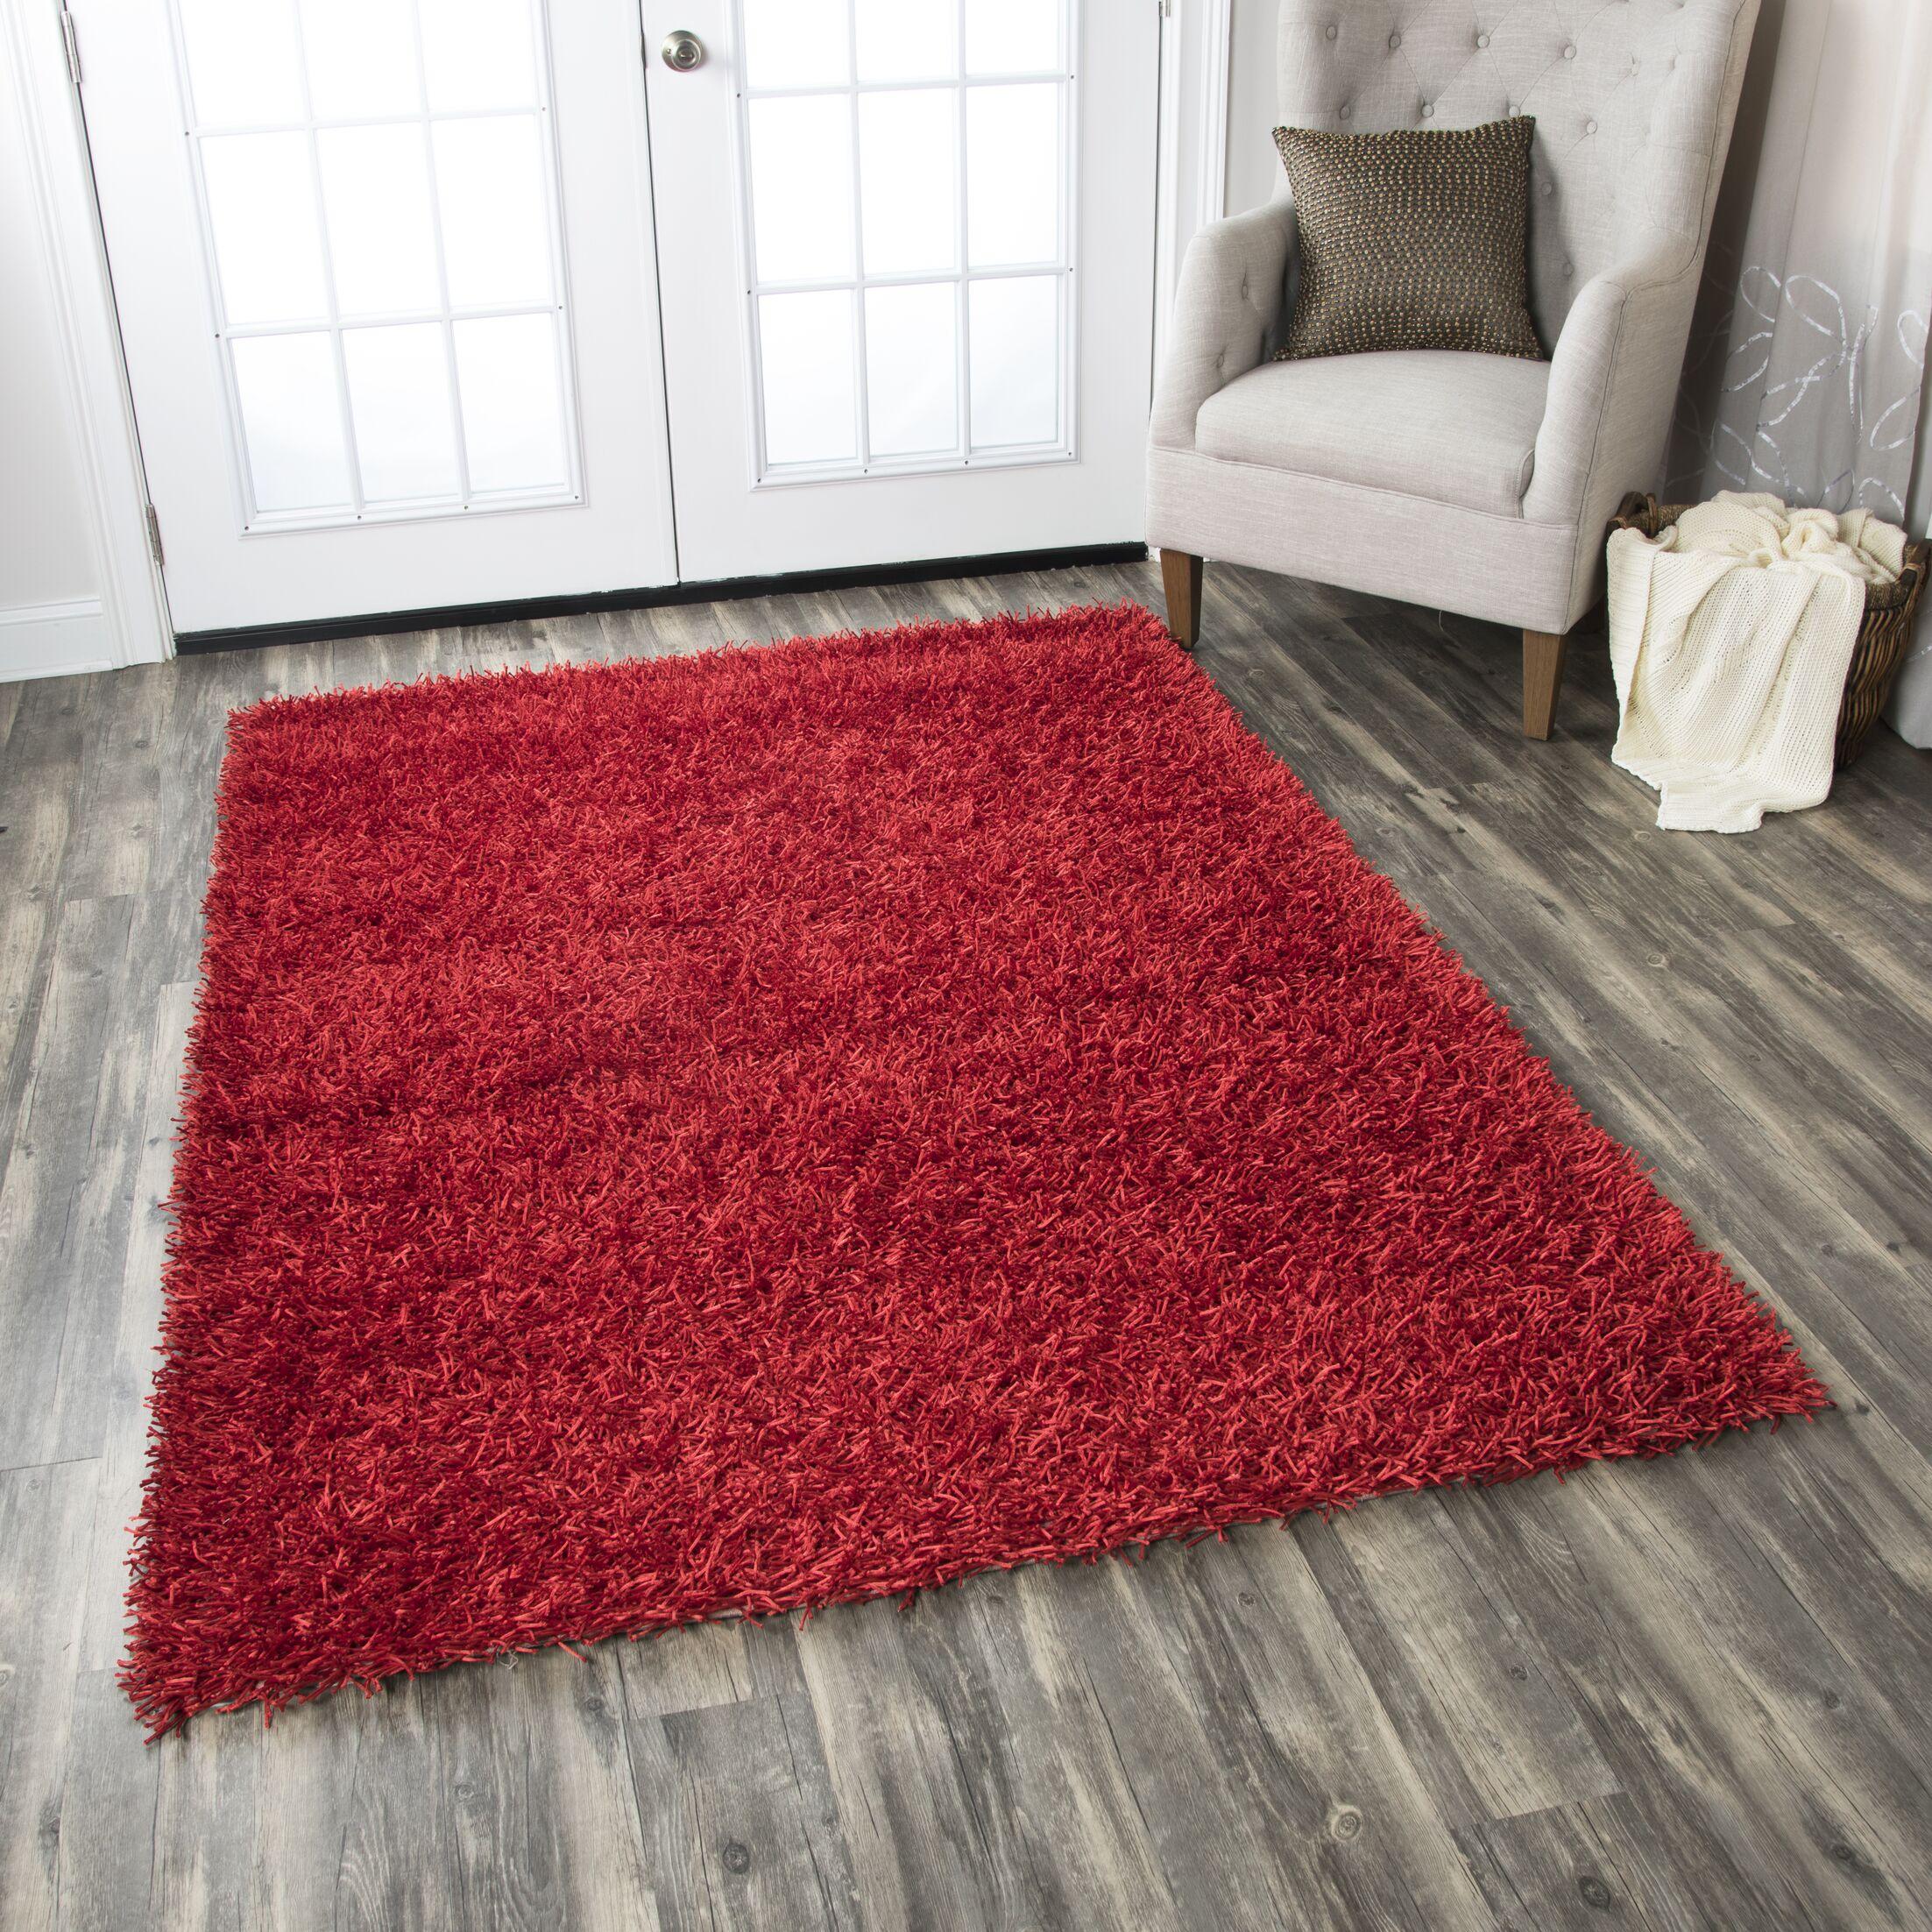 Kiera Handmade Red Area Rug Rug Size: Rectangle 6' x 9'